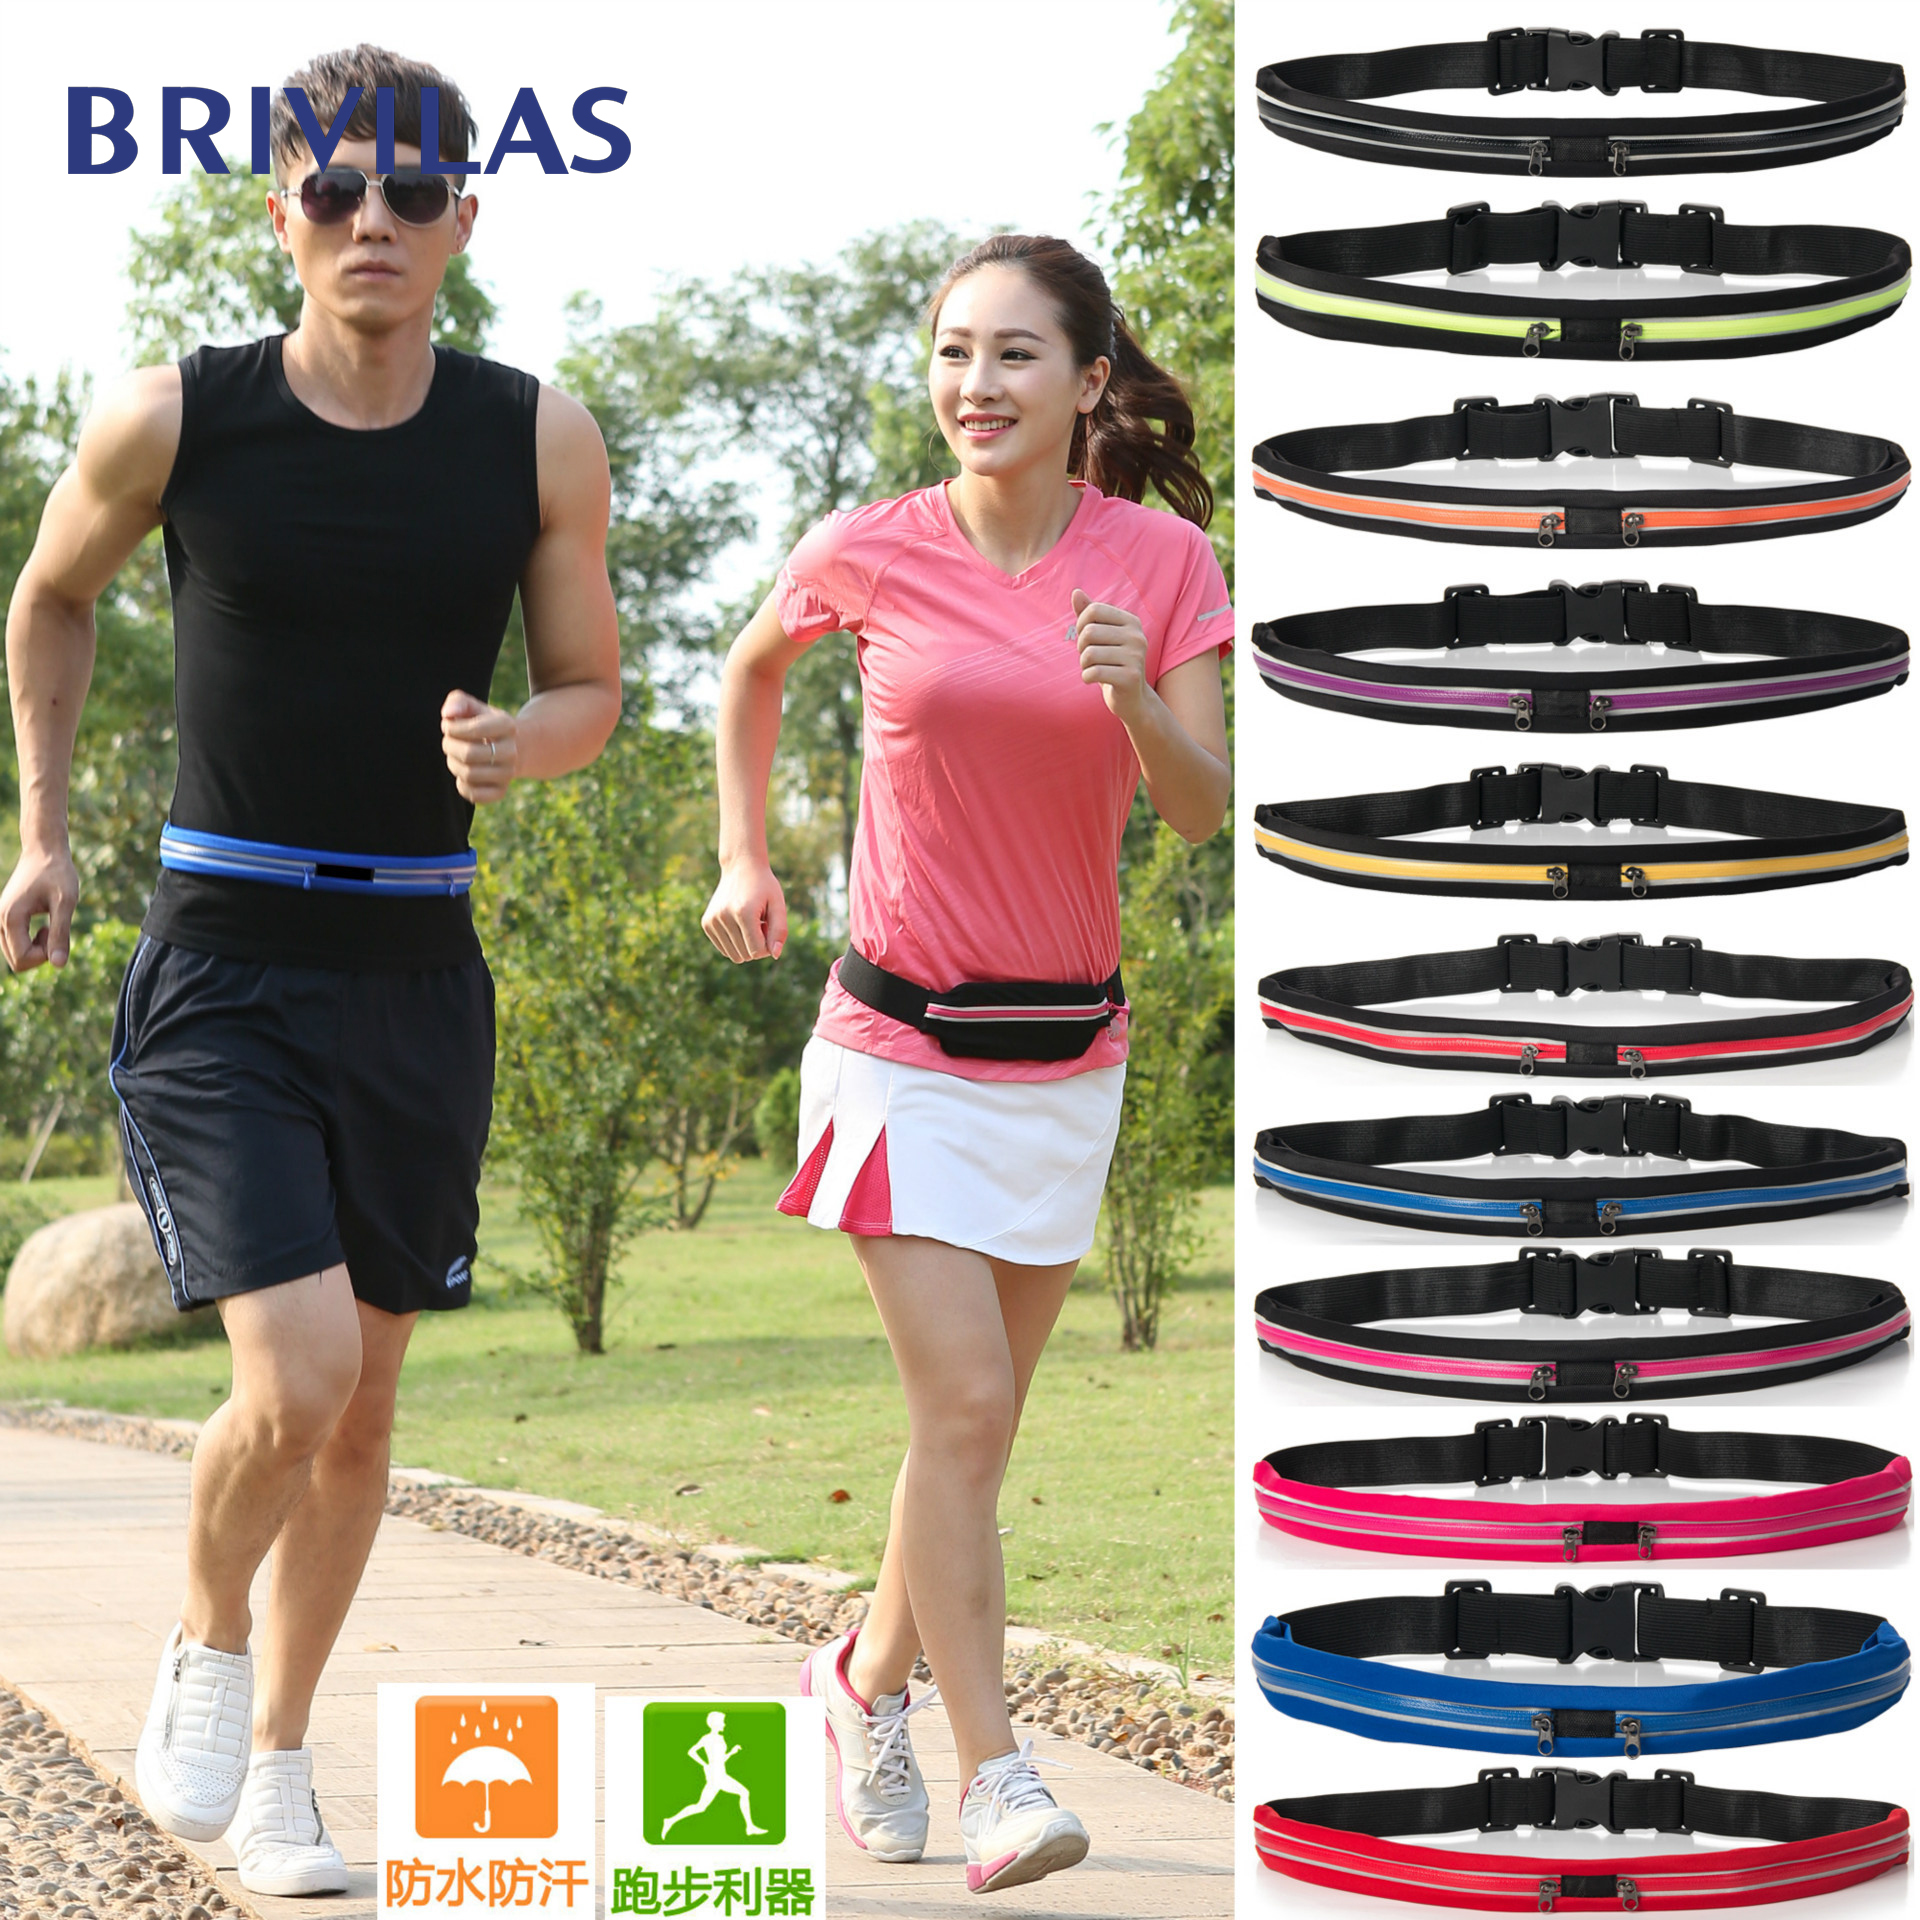 Brivilas Sports Belt Bag Outdoor Run Anti-theft Cycling Purse Women Men High Quality Phone Pocket Zip Portable Waist Bag Mobile